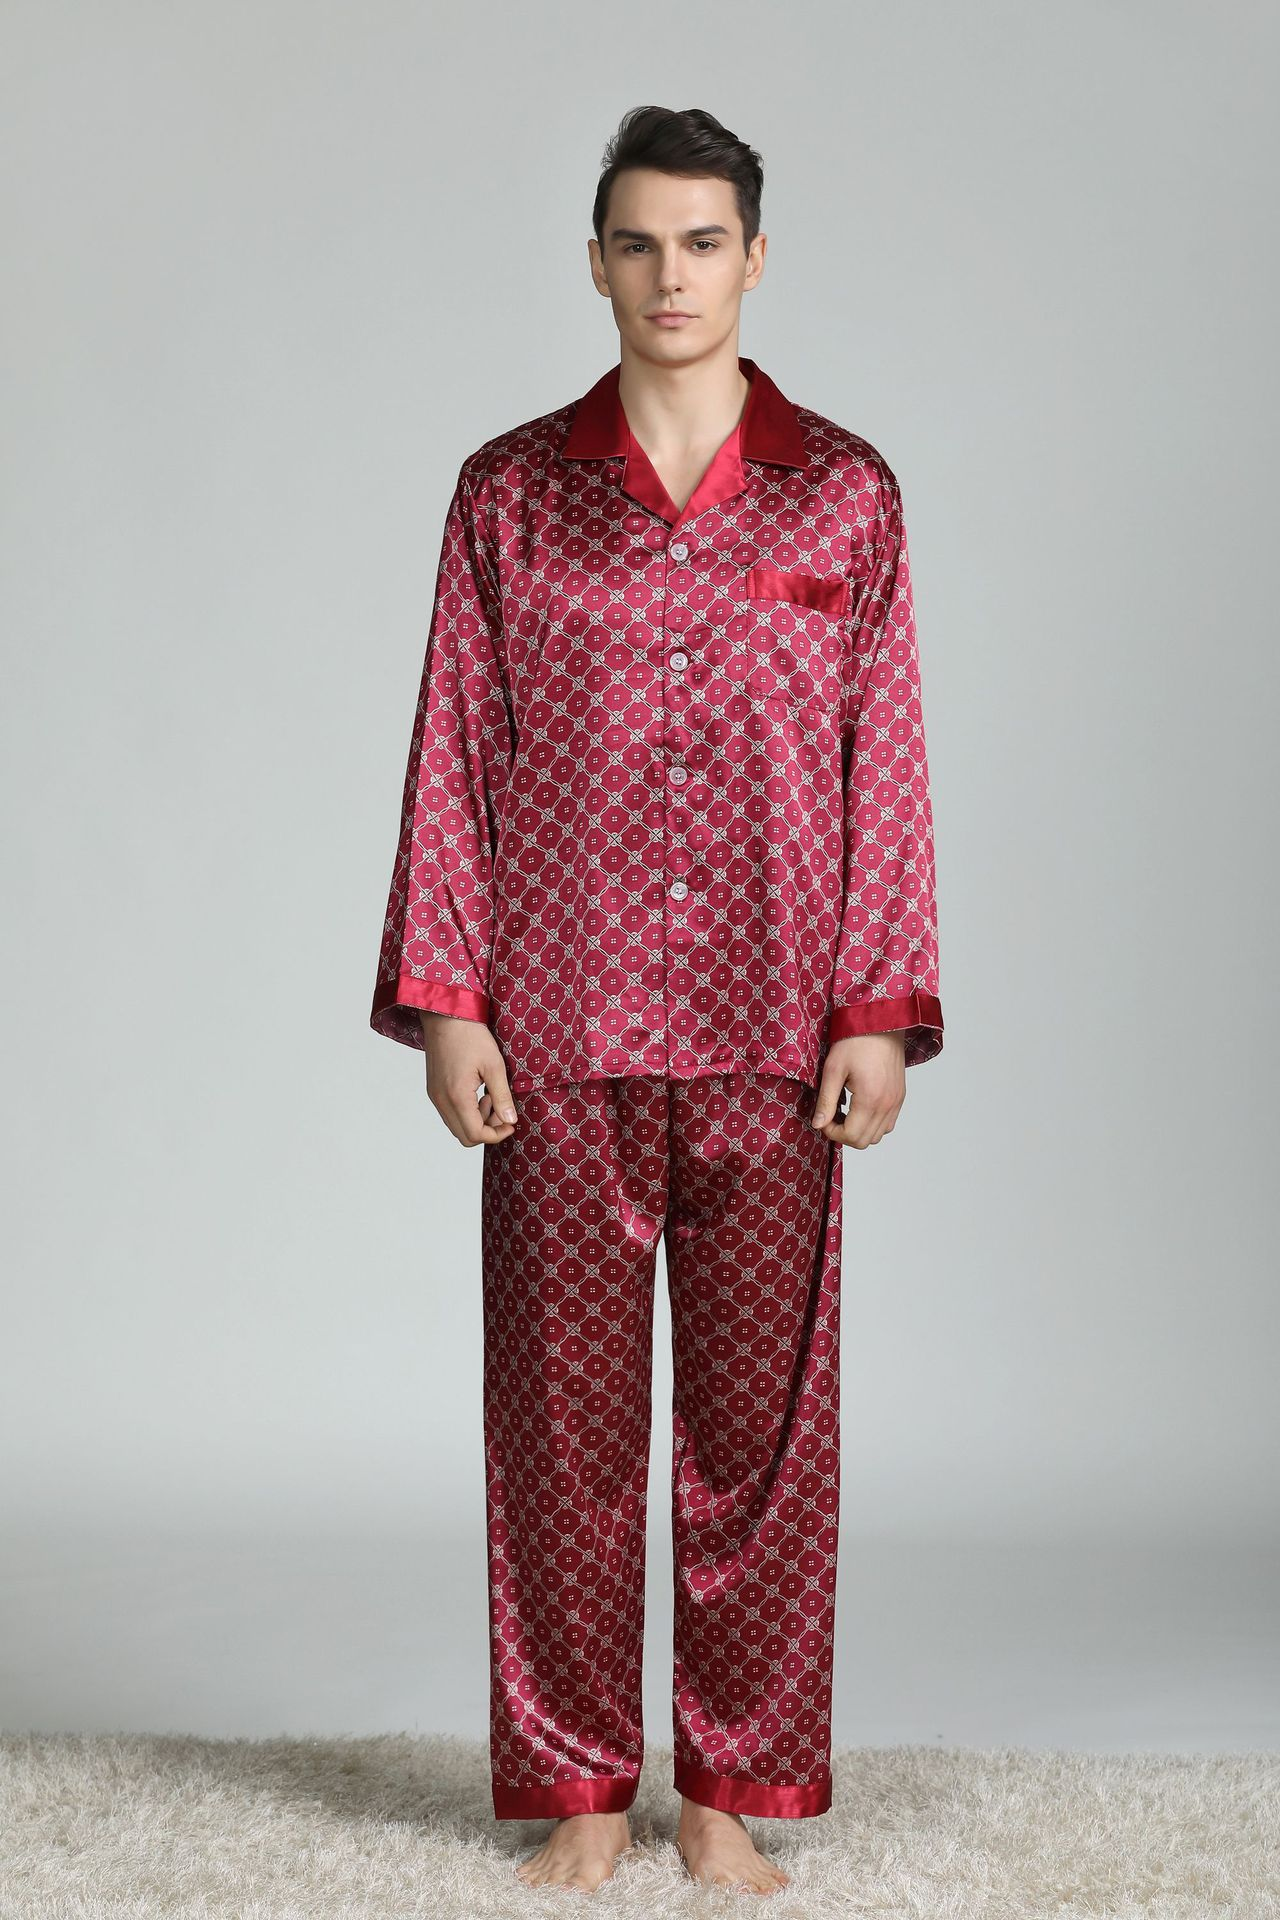 Pijamas de seda para homem sleepwear v-collar